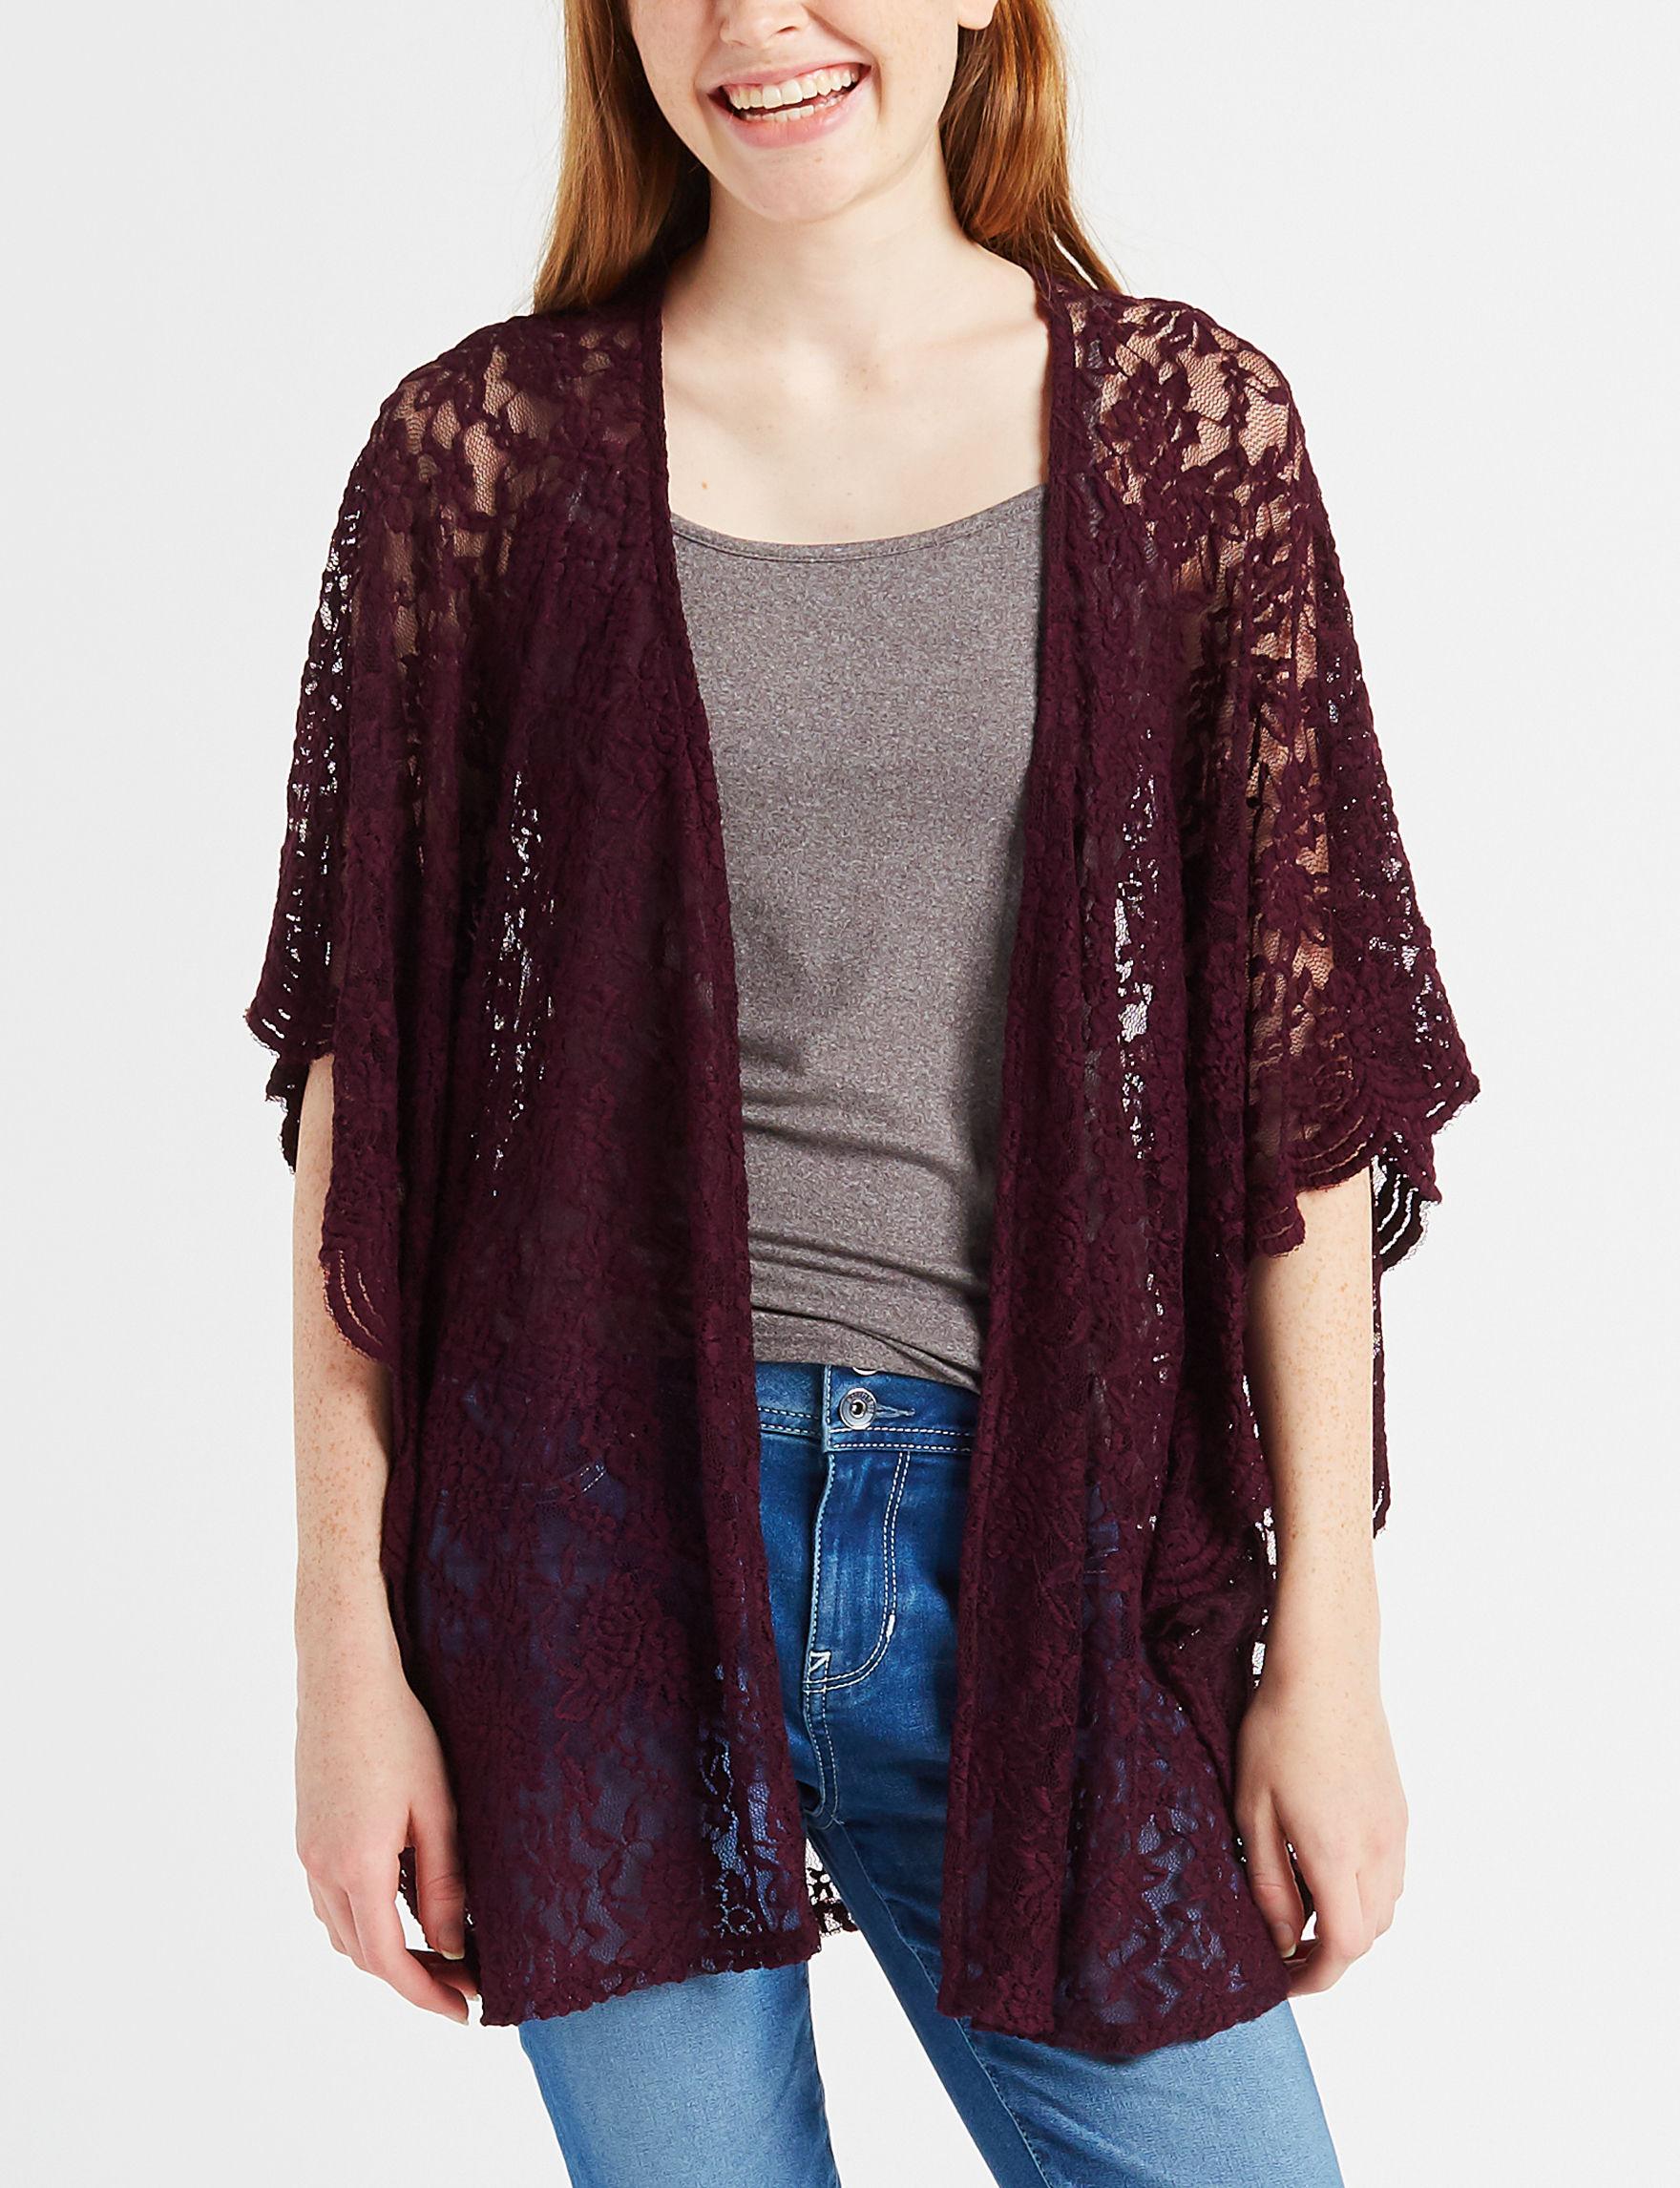 Liberty Love Plum Kimonos & Toppers